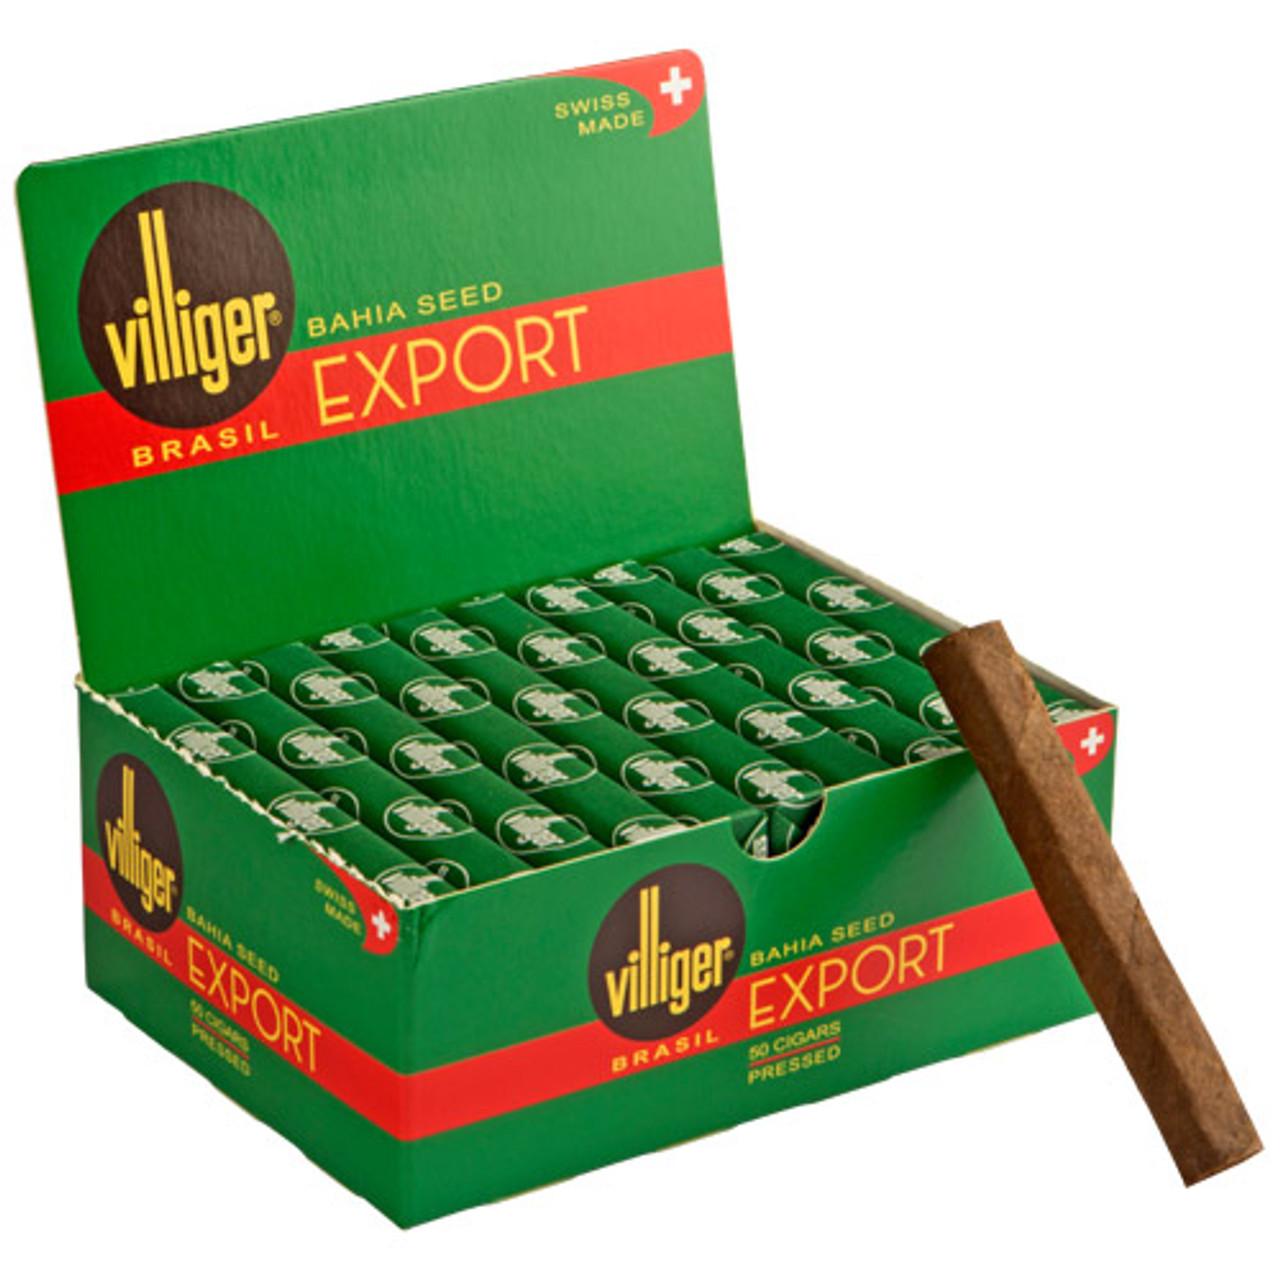 Villiger Export Brazil Cigars (Box of 50) - EMS